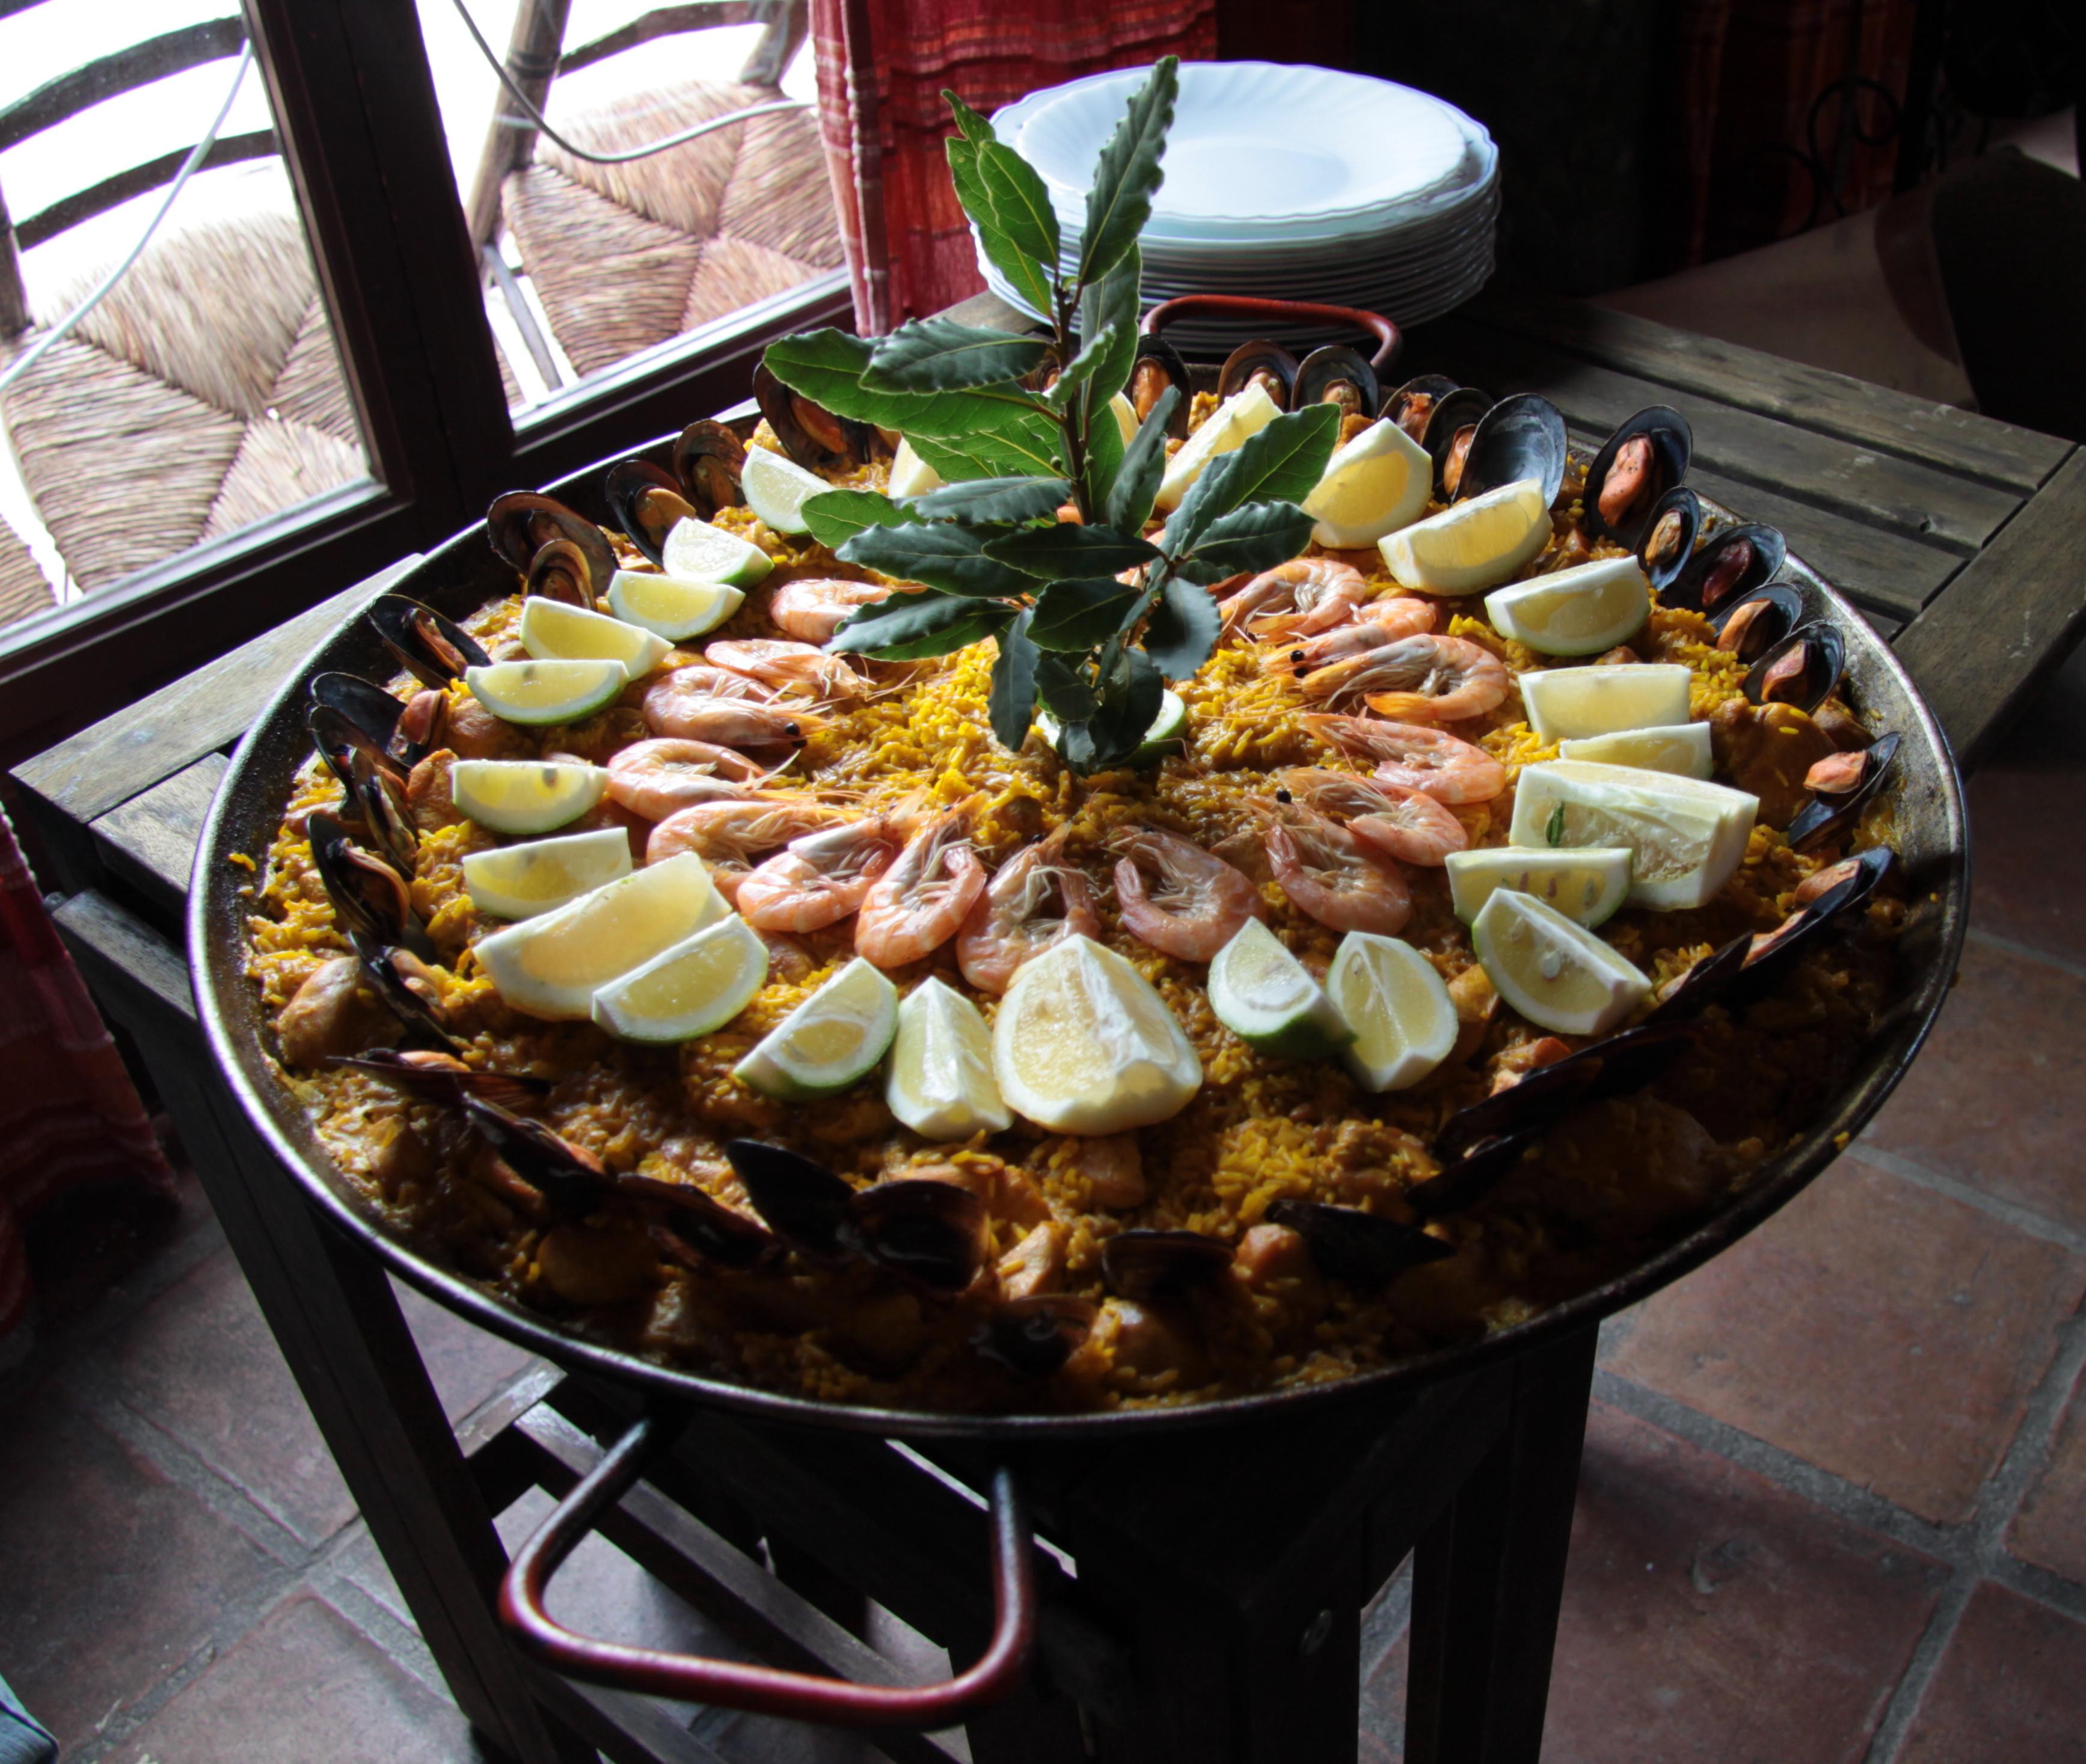 Restaurant Paella Barcelone Le Meilleur